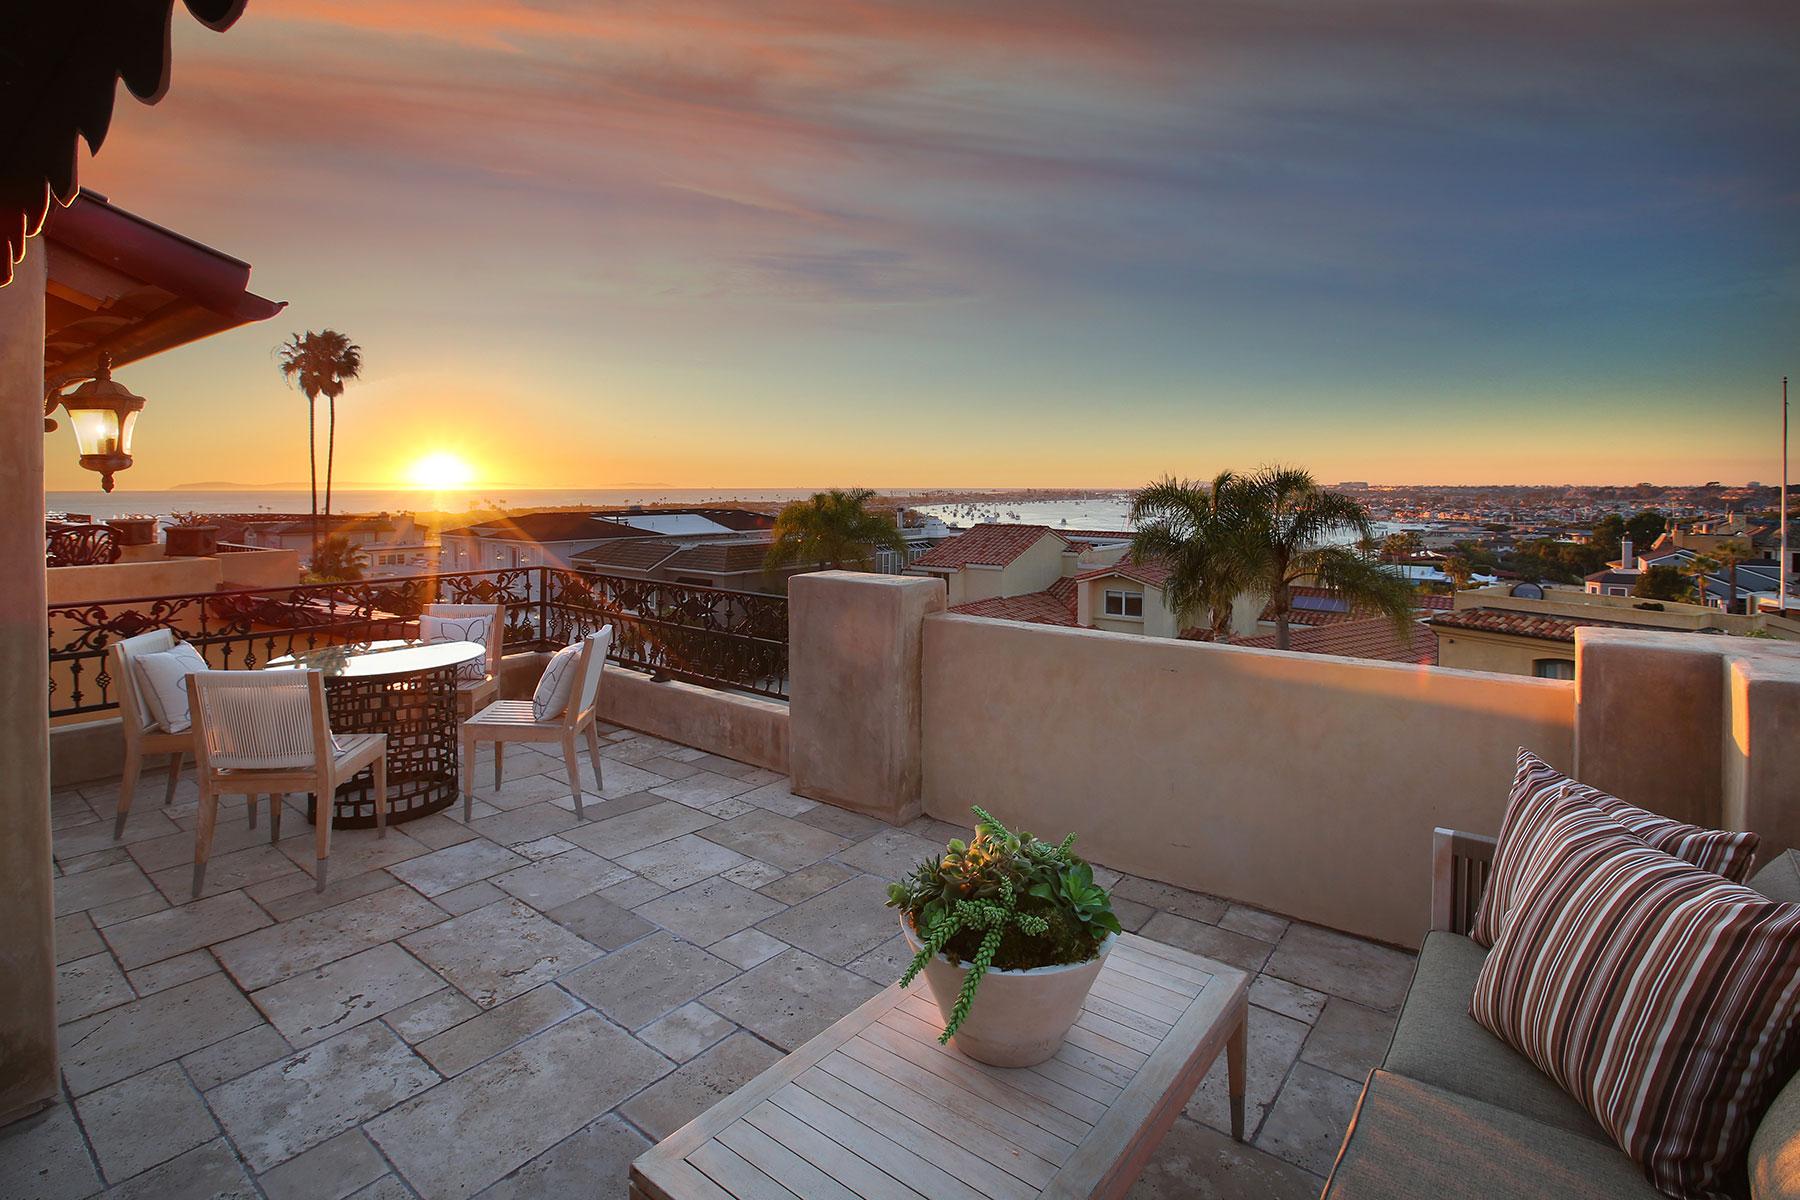 Moradia para Venda às 312 Carnation Corona Del Mar, Califórnia, 92625 Estados Unidos